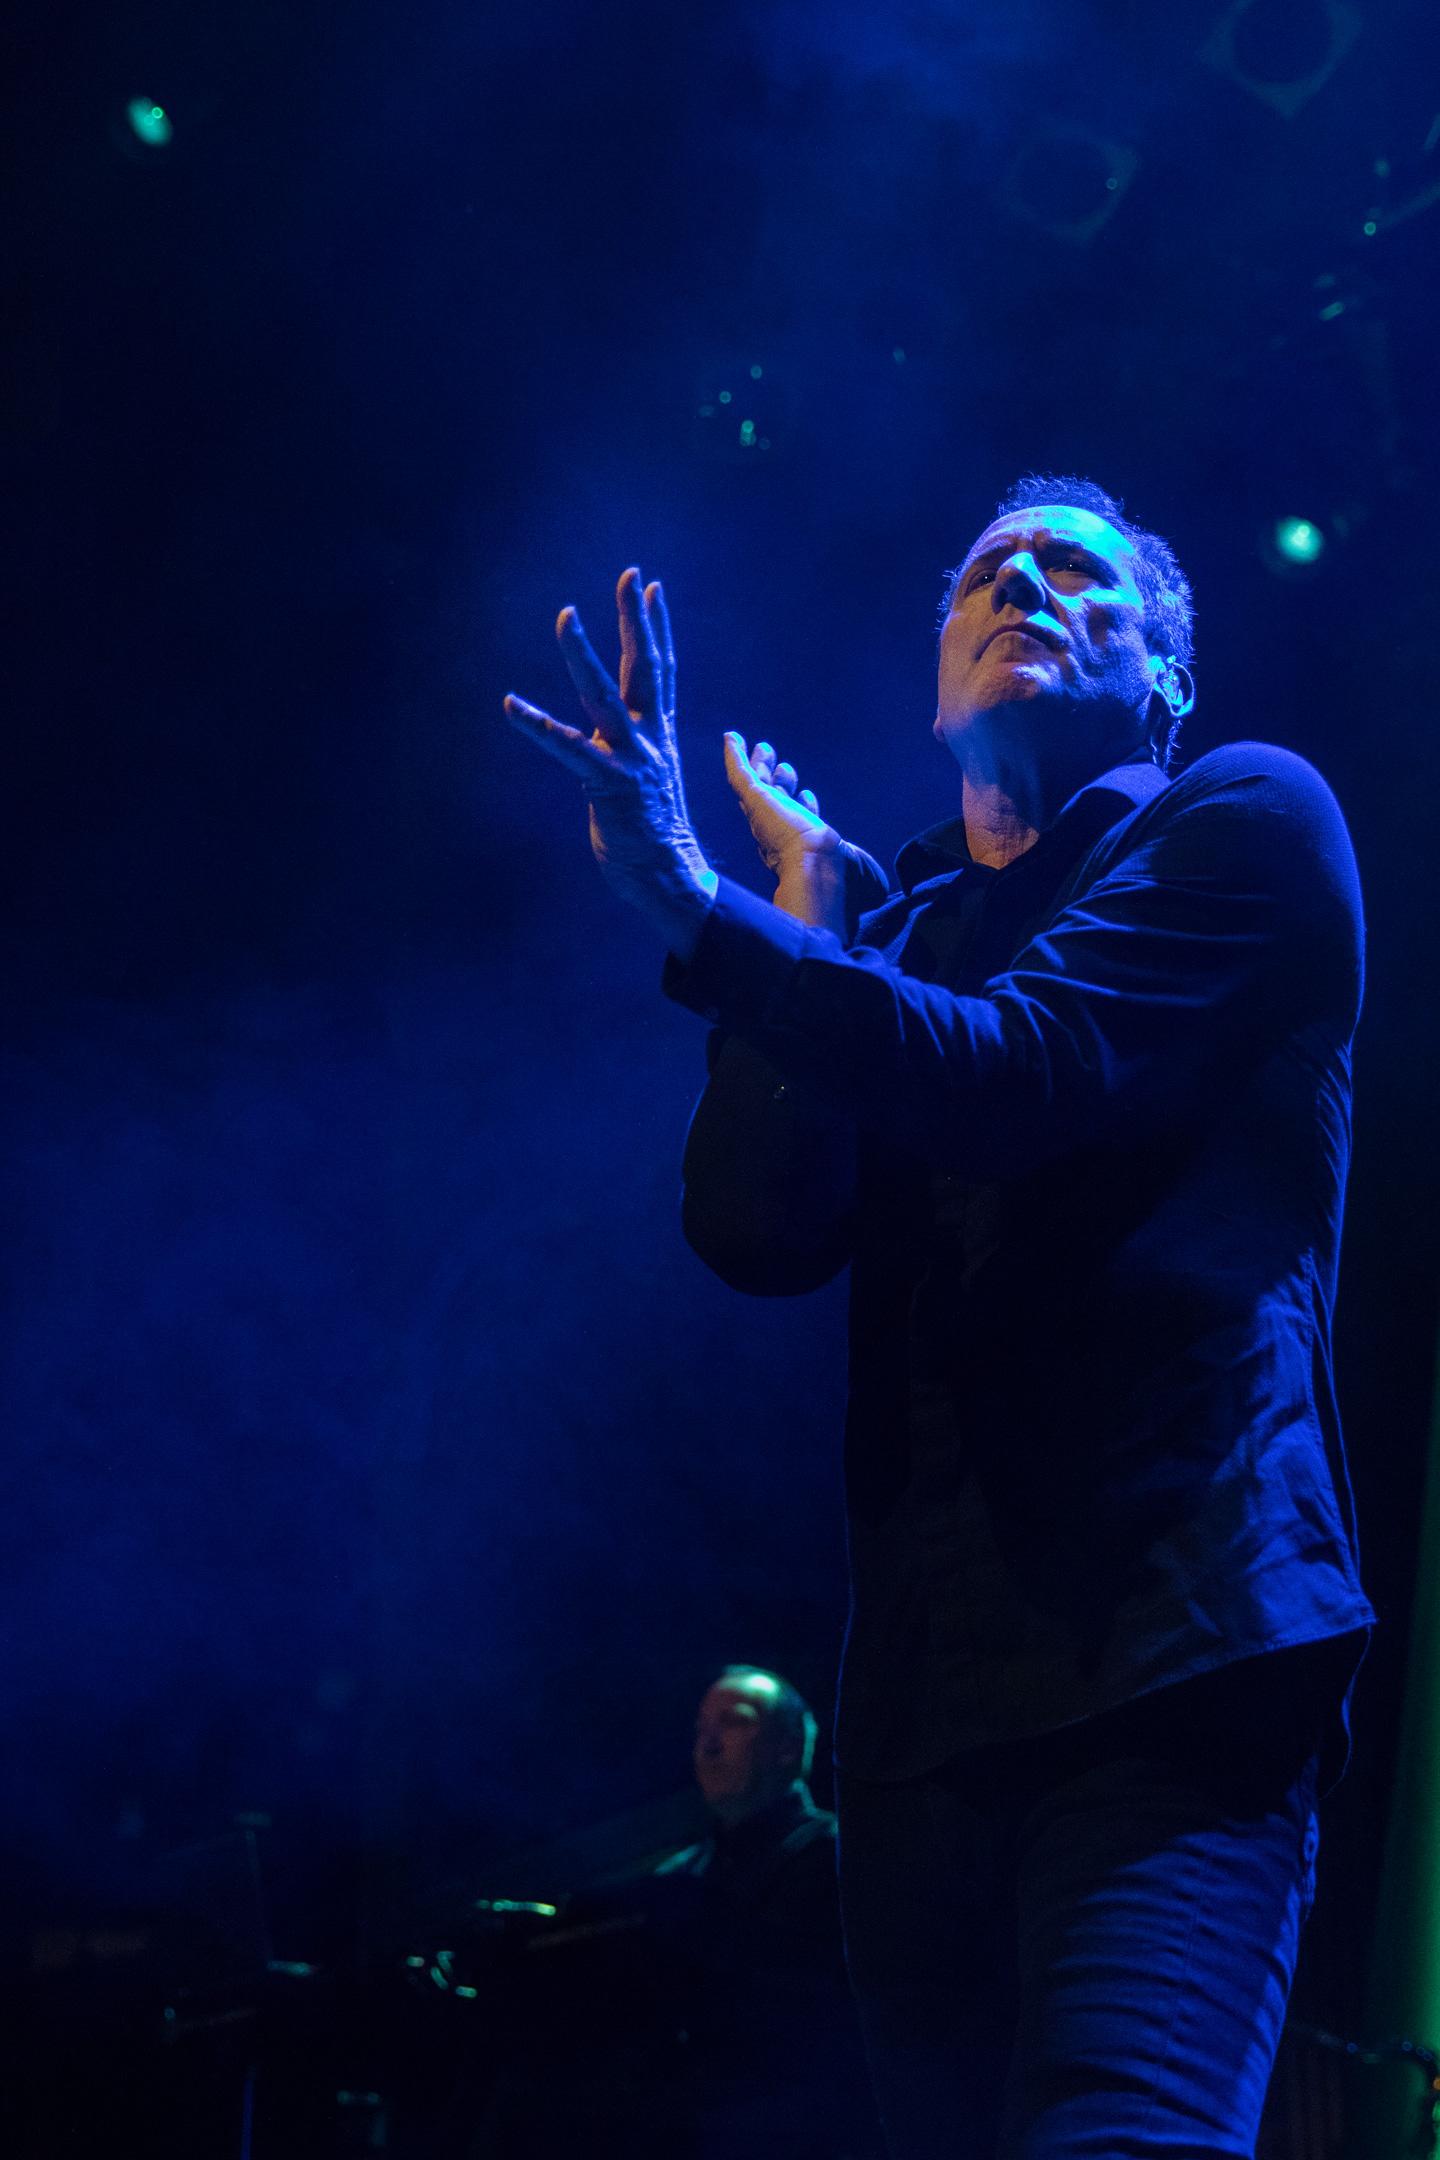 Orchestral Manoeuvres in the Dark (OMD) - Concert Photos - Denver Ogden Theatre